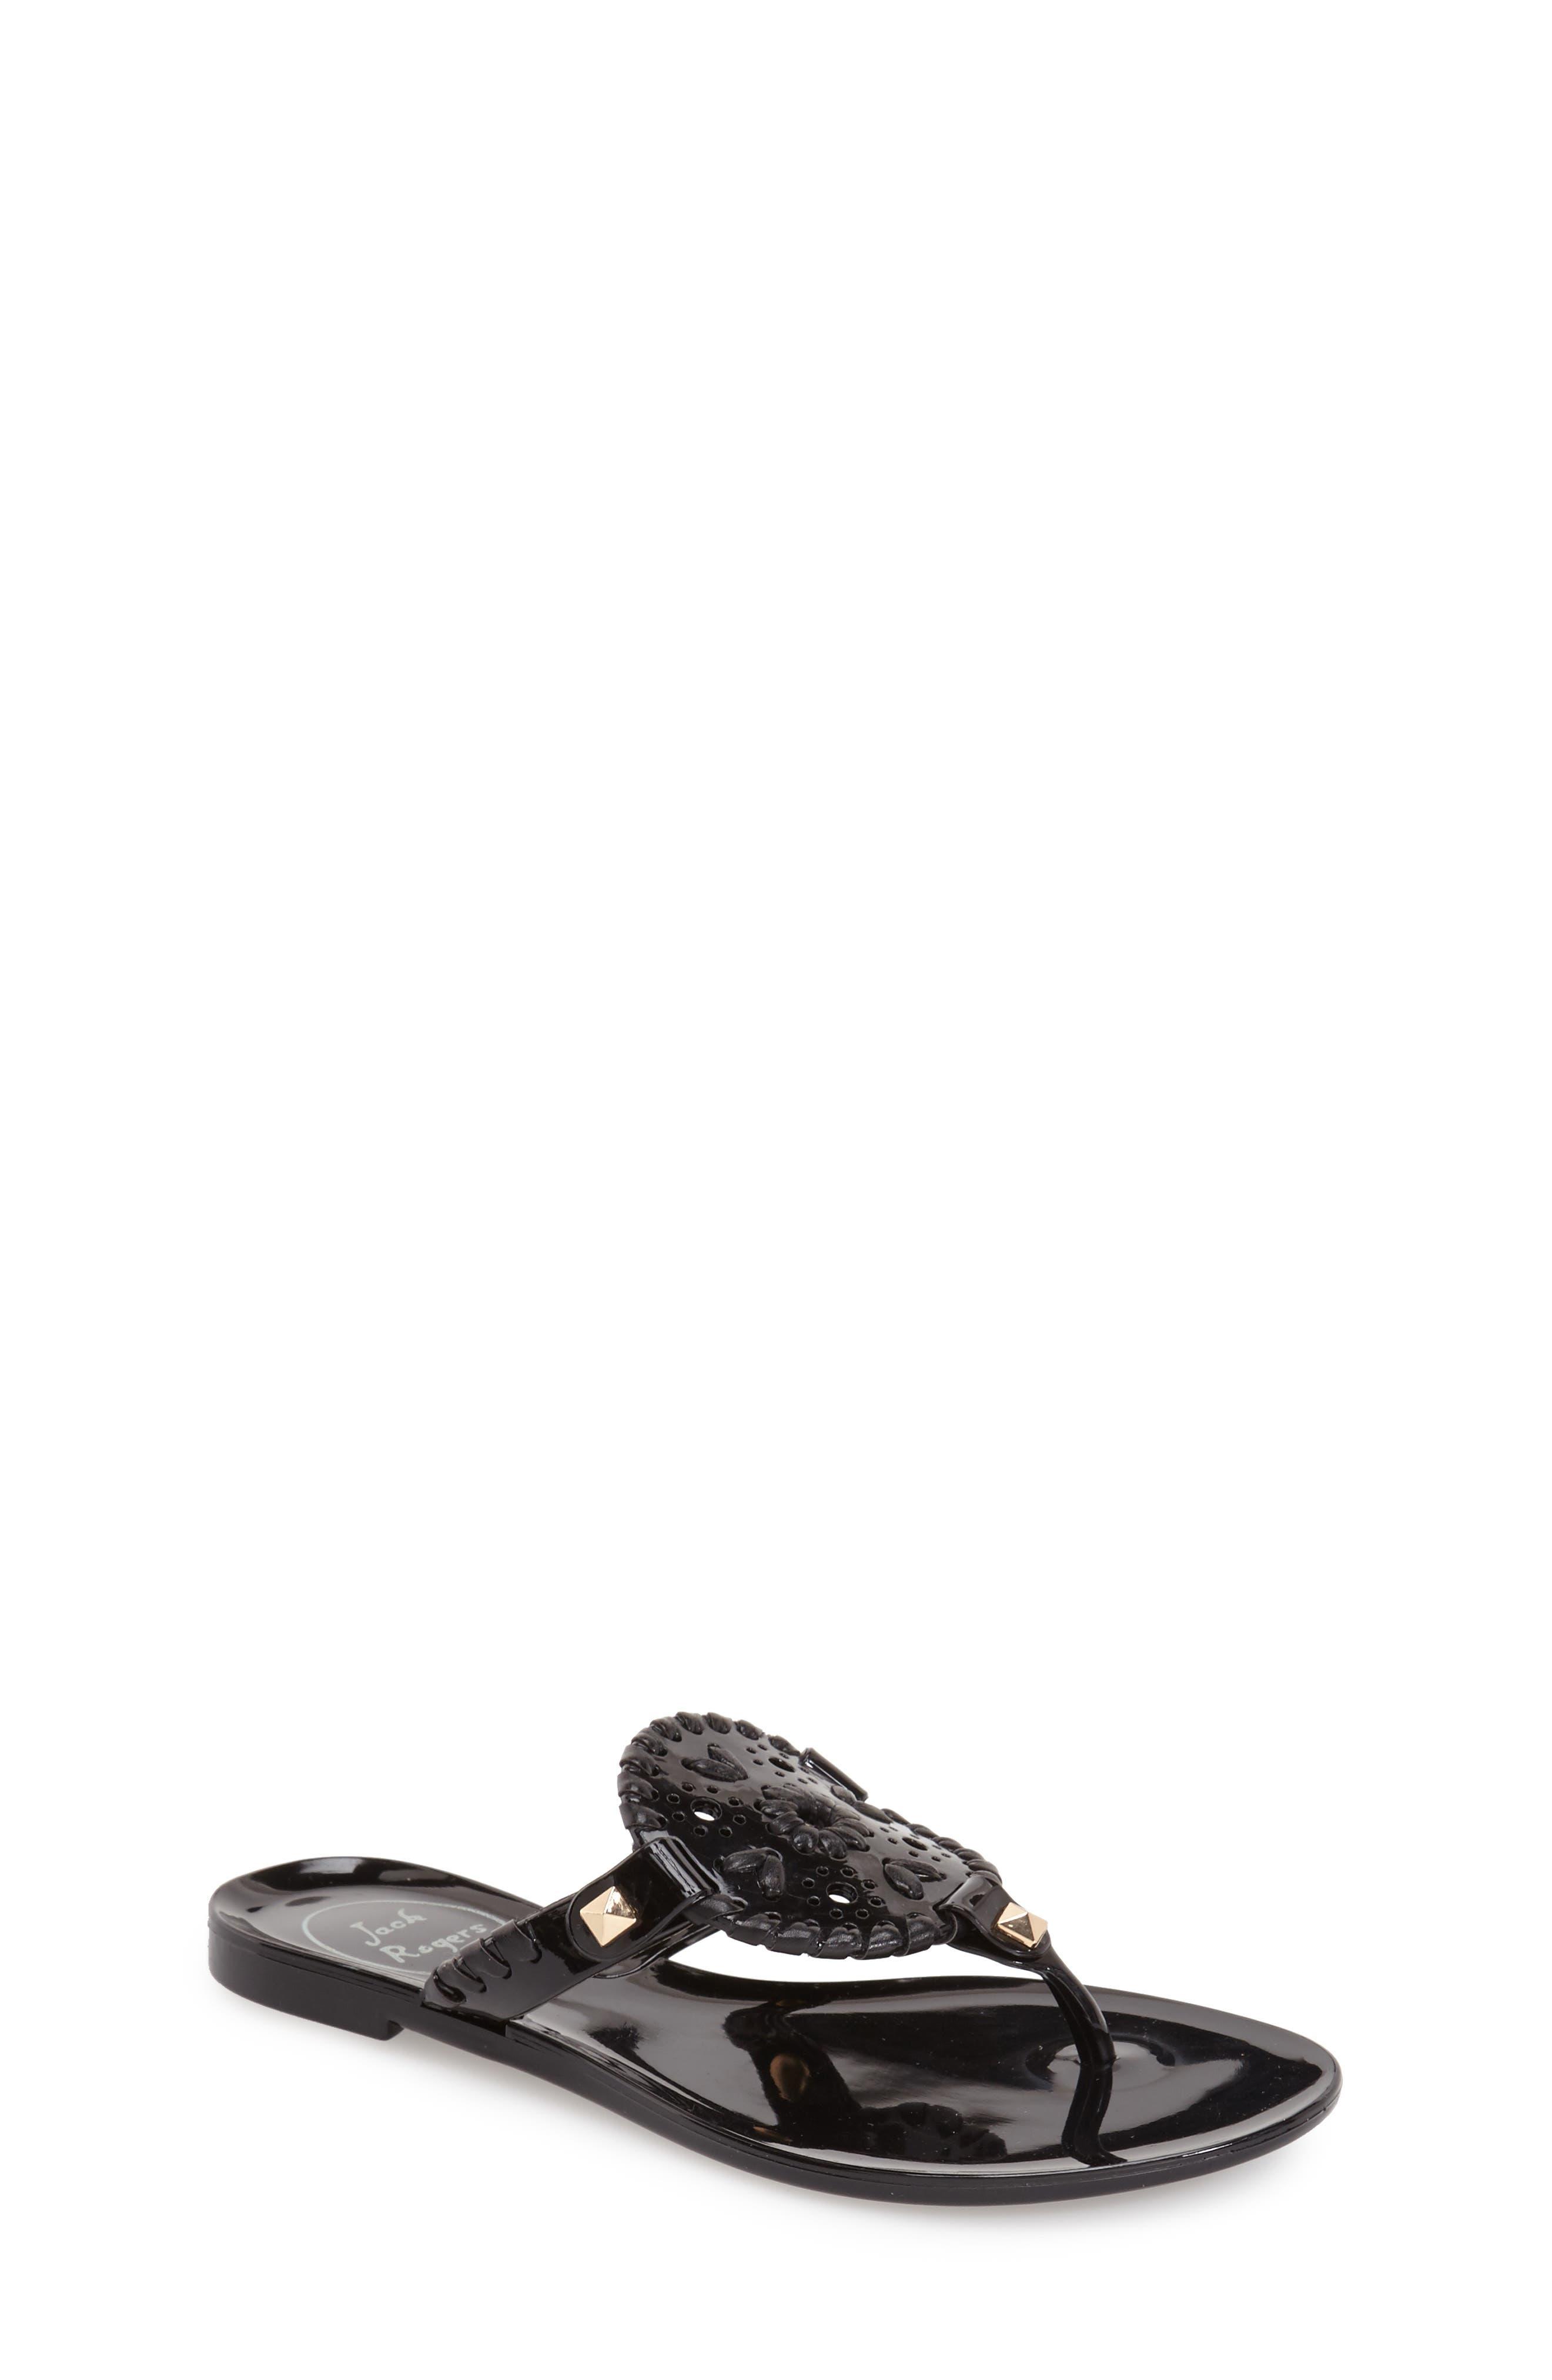 JACK ROGERS 'Miss Georgica' Jelly Flip Flop, Main, color, BLACK